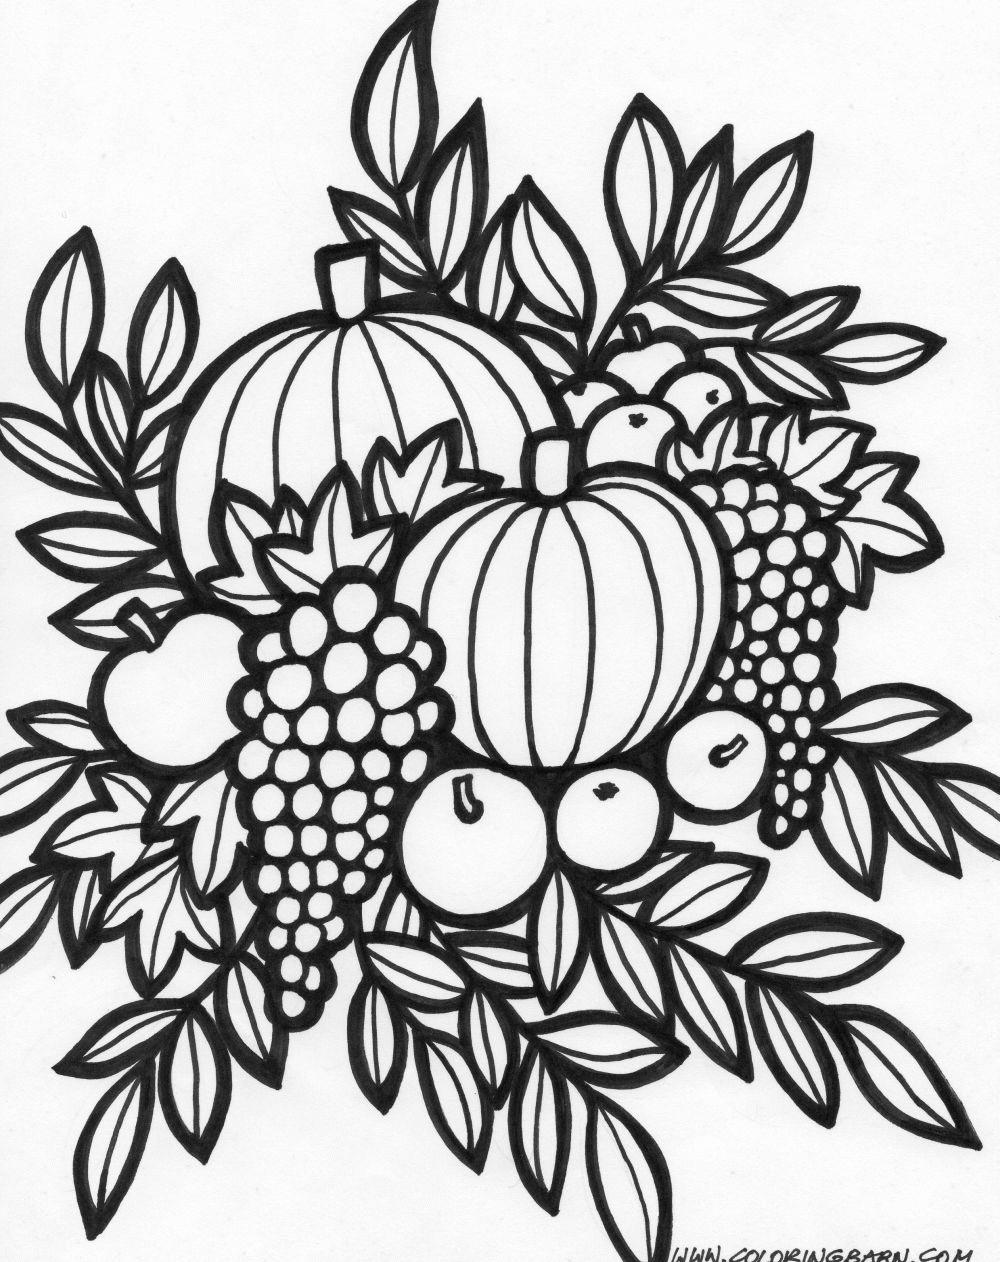 Thanksgiving Arrangement Coloring Page Continue Reading Thanksgiving Coloring Pages Free Thanksgiving Coloring Pages Fall Coloring Pages [ 1262 x 1000 Pixel ]